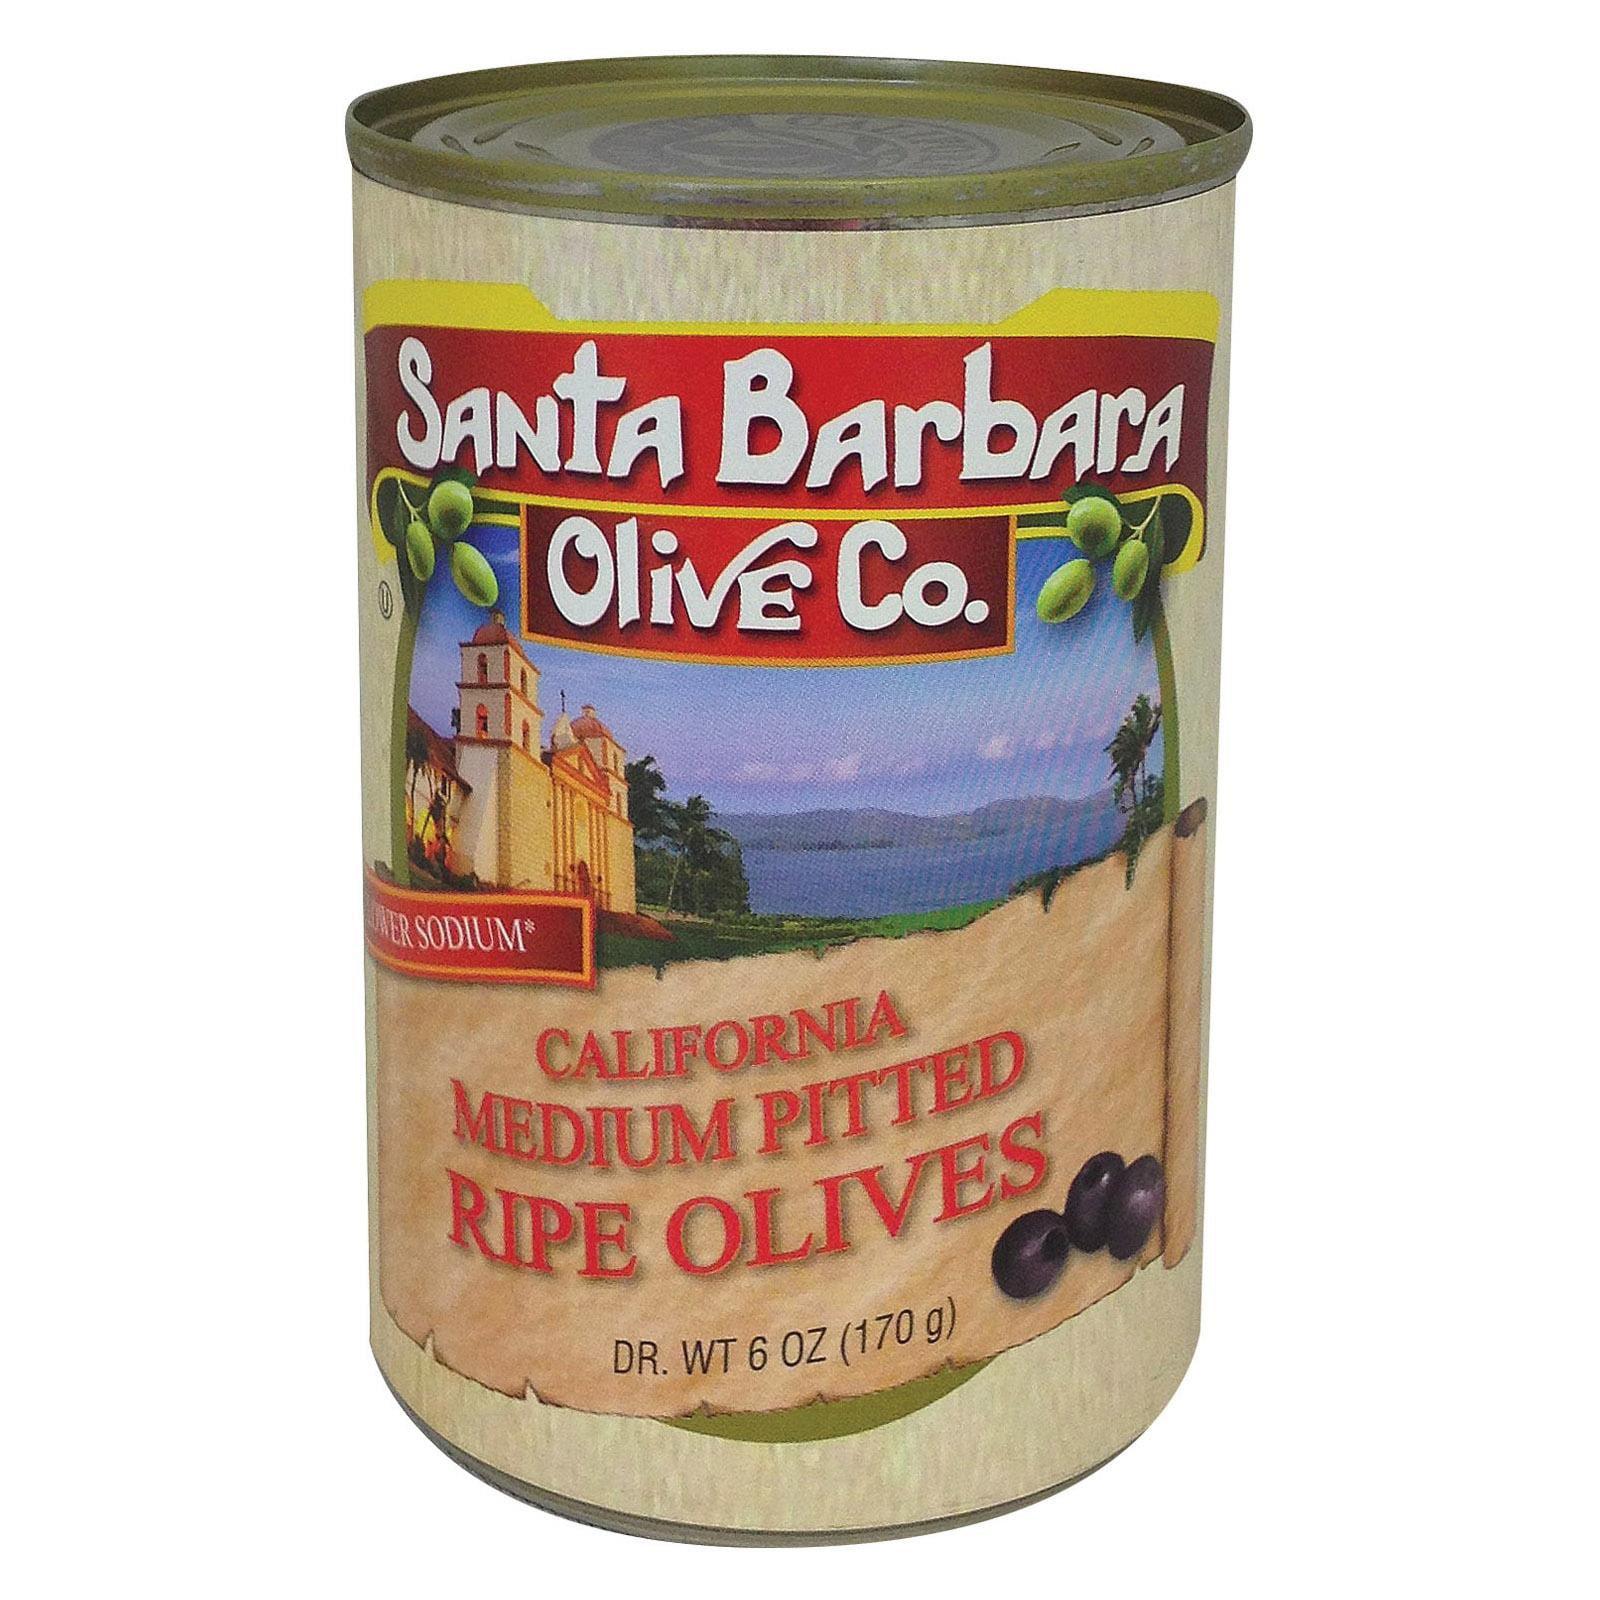 Santa Barbara California Ripe Olives - Medium Pitted - Pack of 12 - 6 Oz.